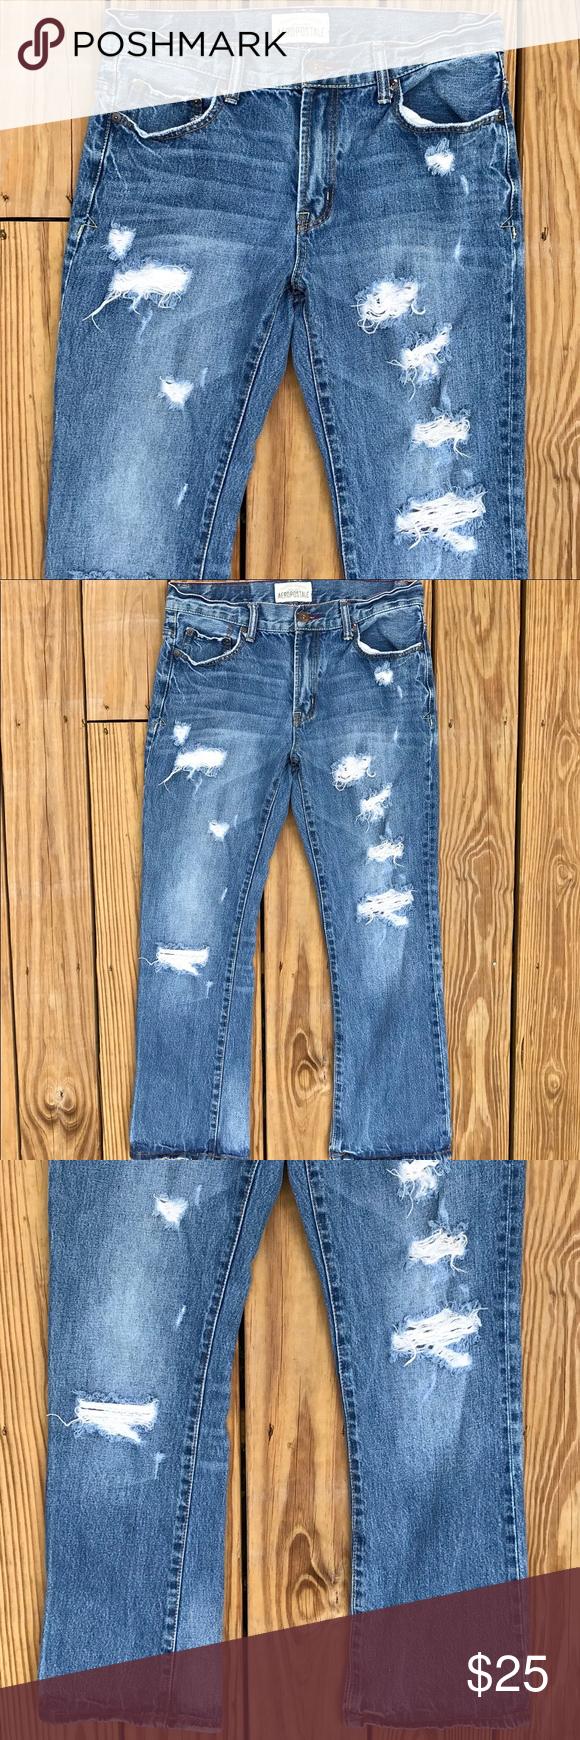 4d2598f6670 Aeropostale Driggs Slim Bootcut Distressed Jeans Description: Mens  Aeropostale Driggs Slim Bootcut Distressed Destroyed Denim